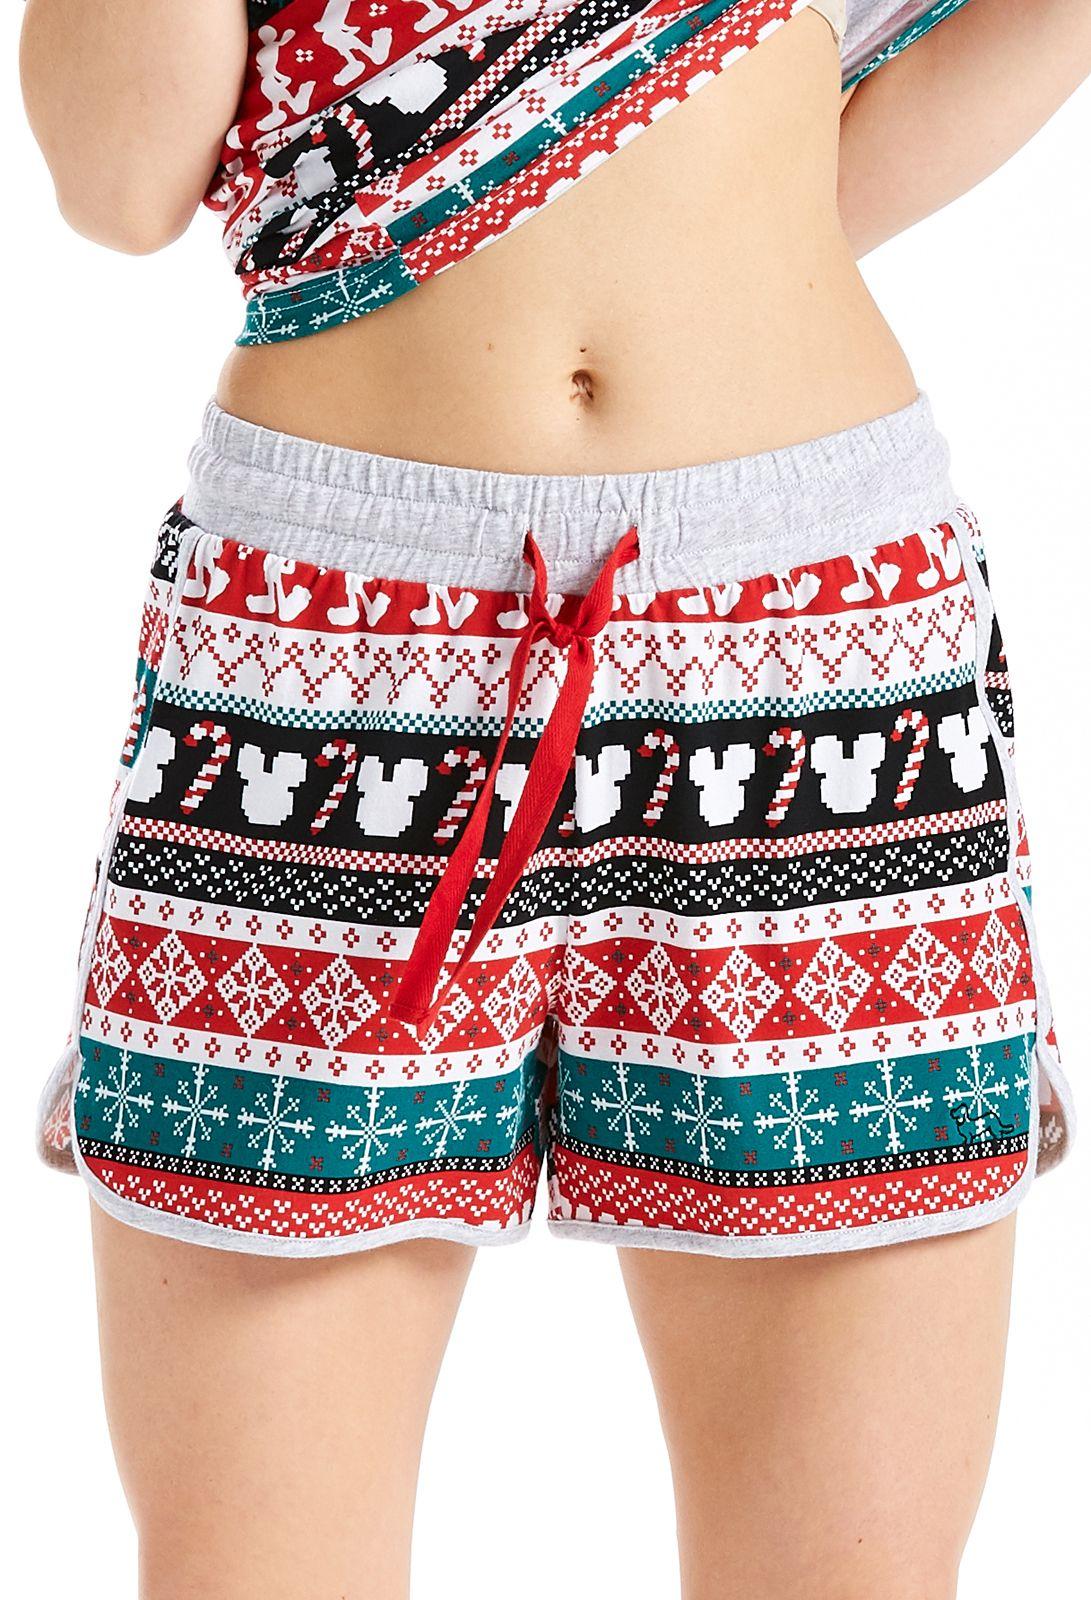 Xmas Disney Mid Short Peter Alexander Pajama shorts